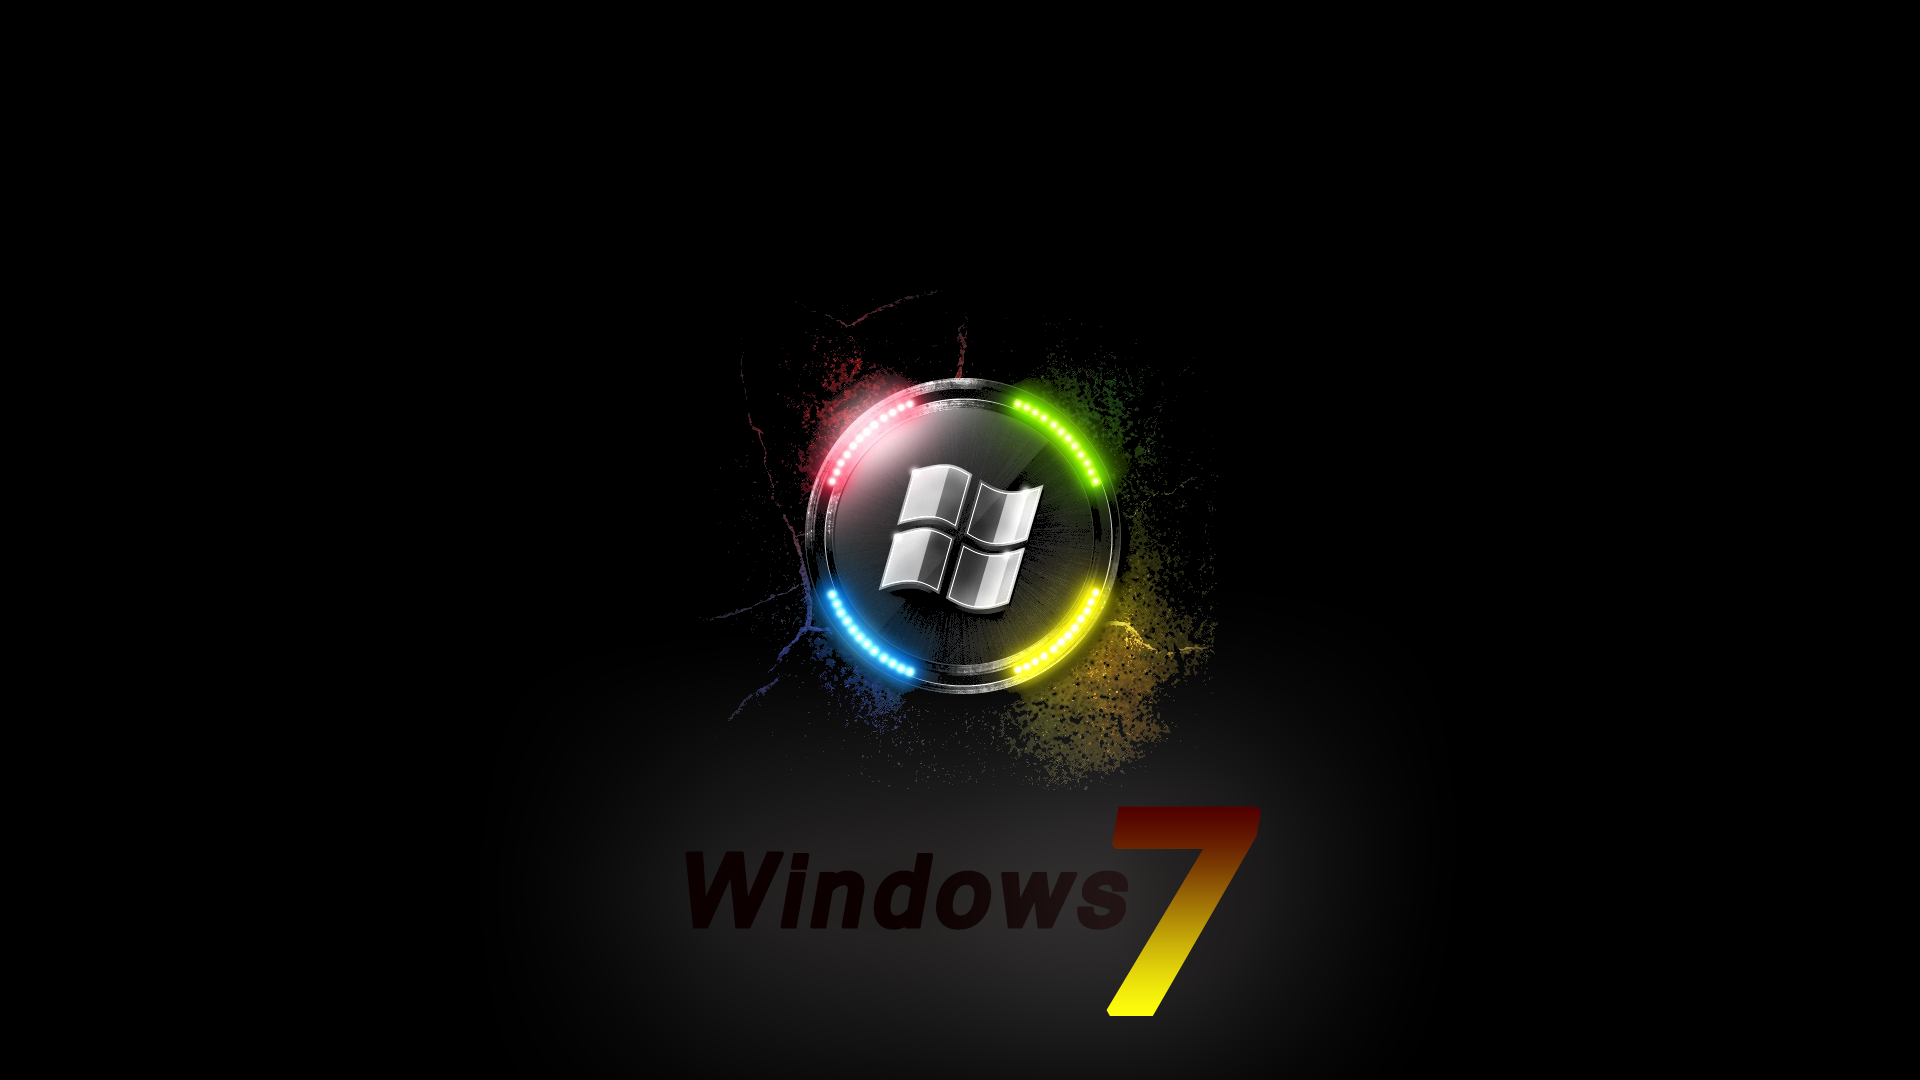 Windows 7 Ultimate wallpaper 139220 1920x1080